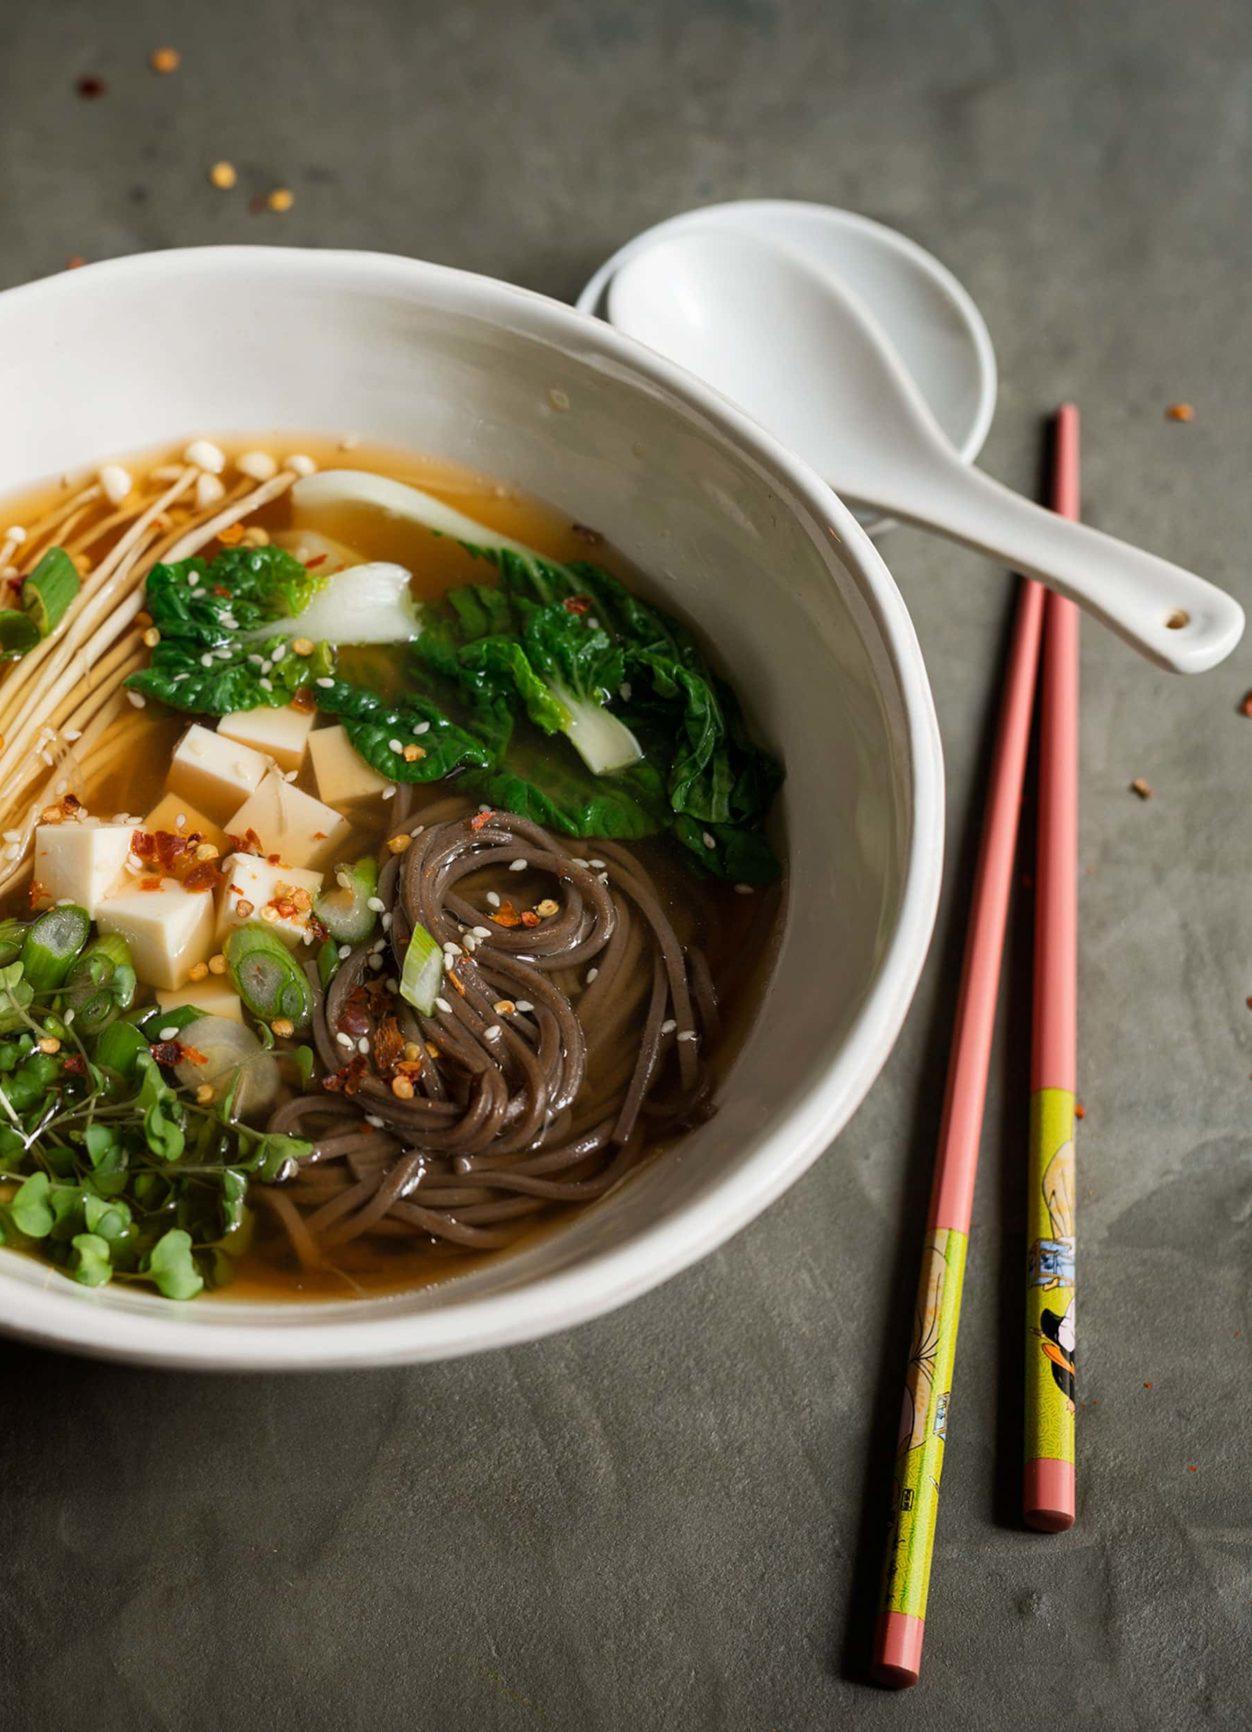 Miso Suppe mit Sobanudeln, Pak Choi, Enoki und Silk Tofu